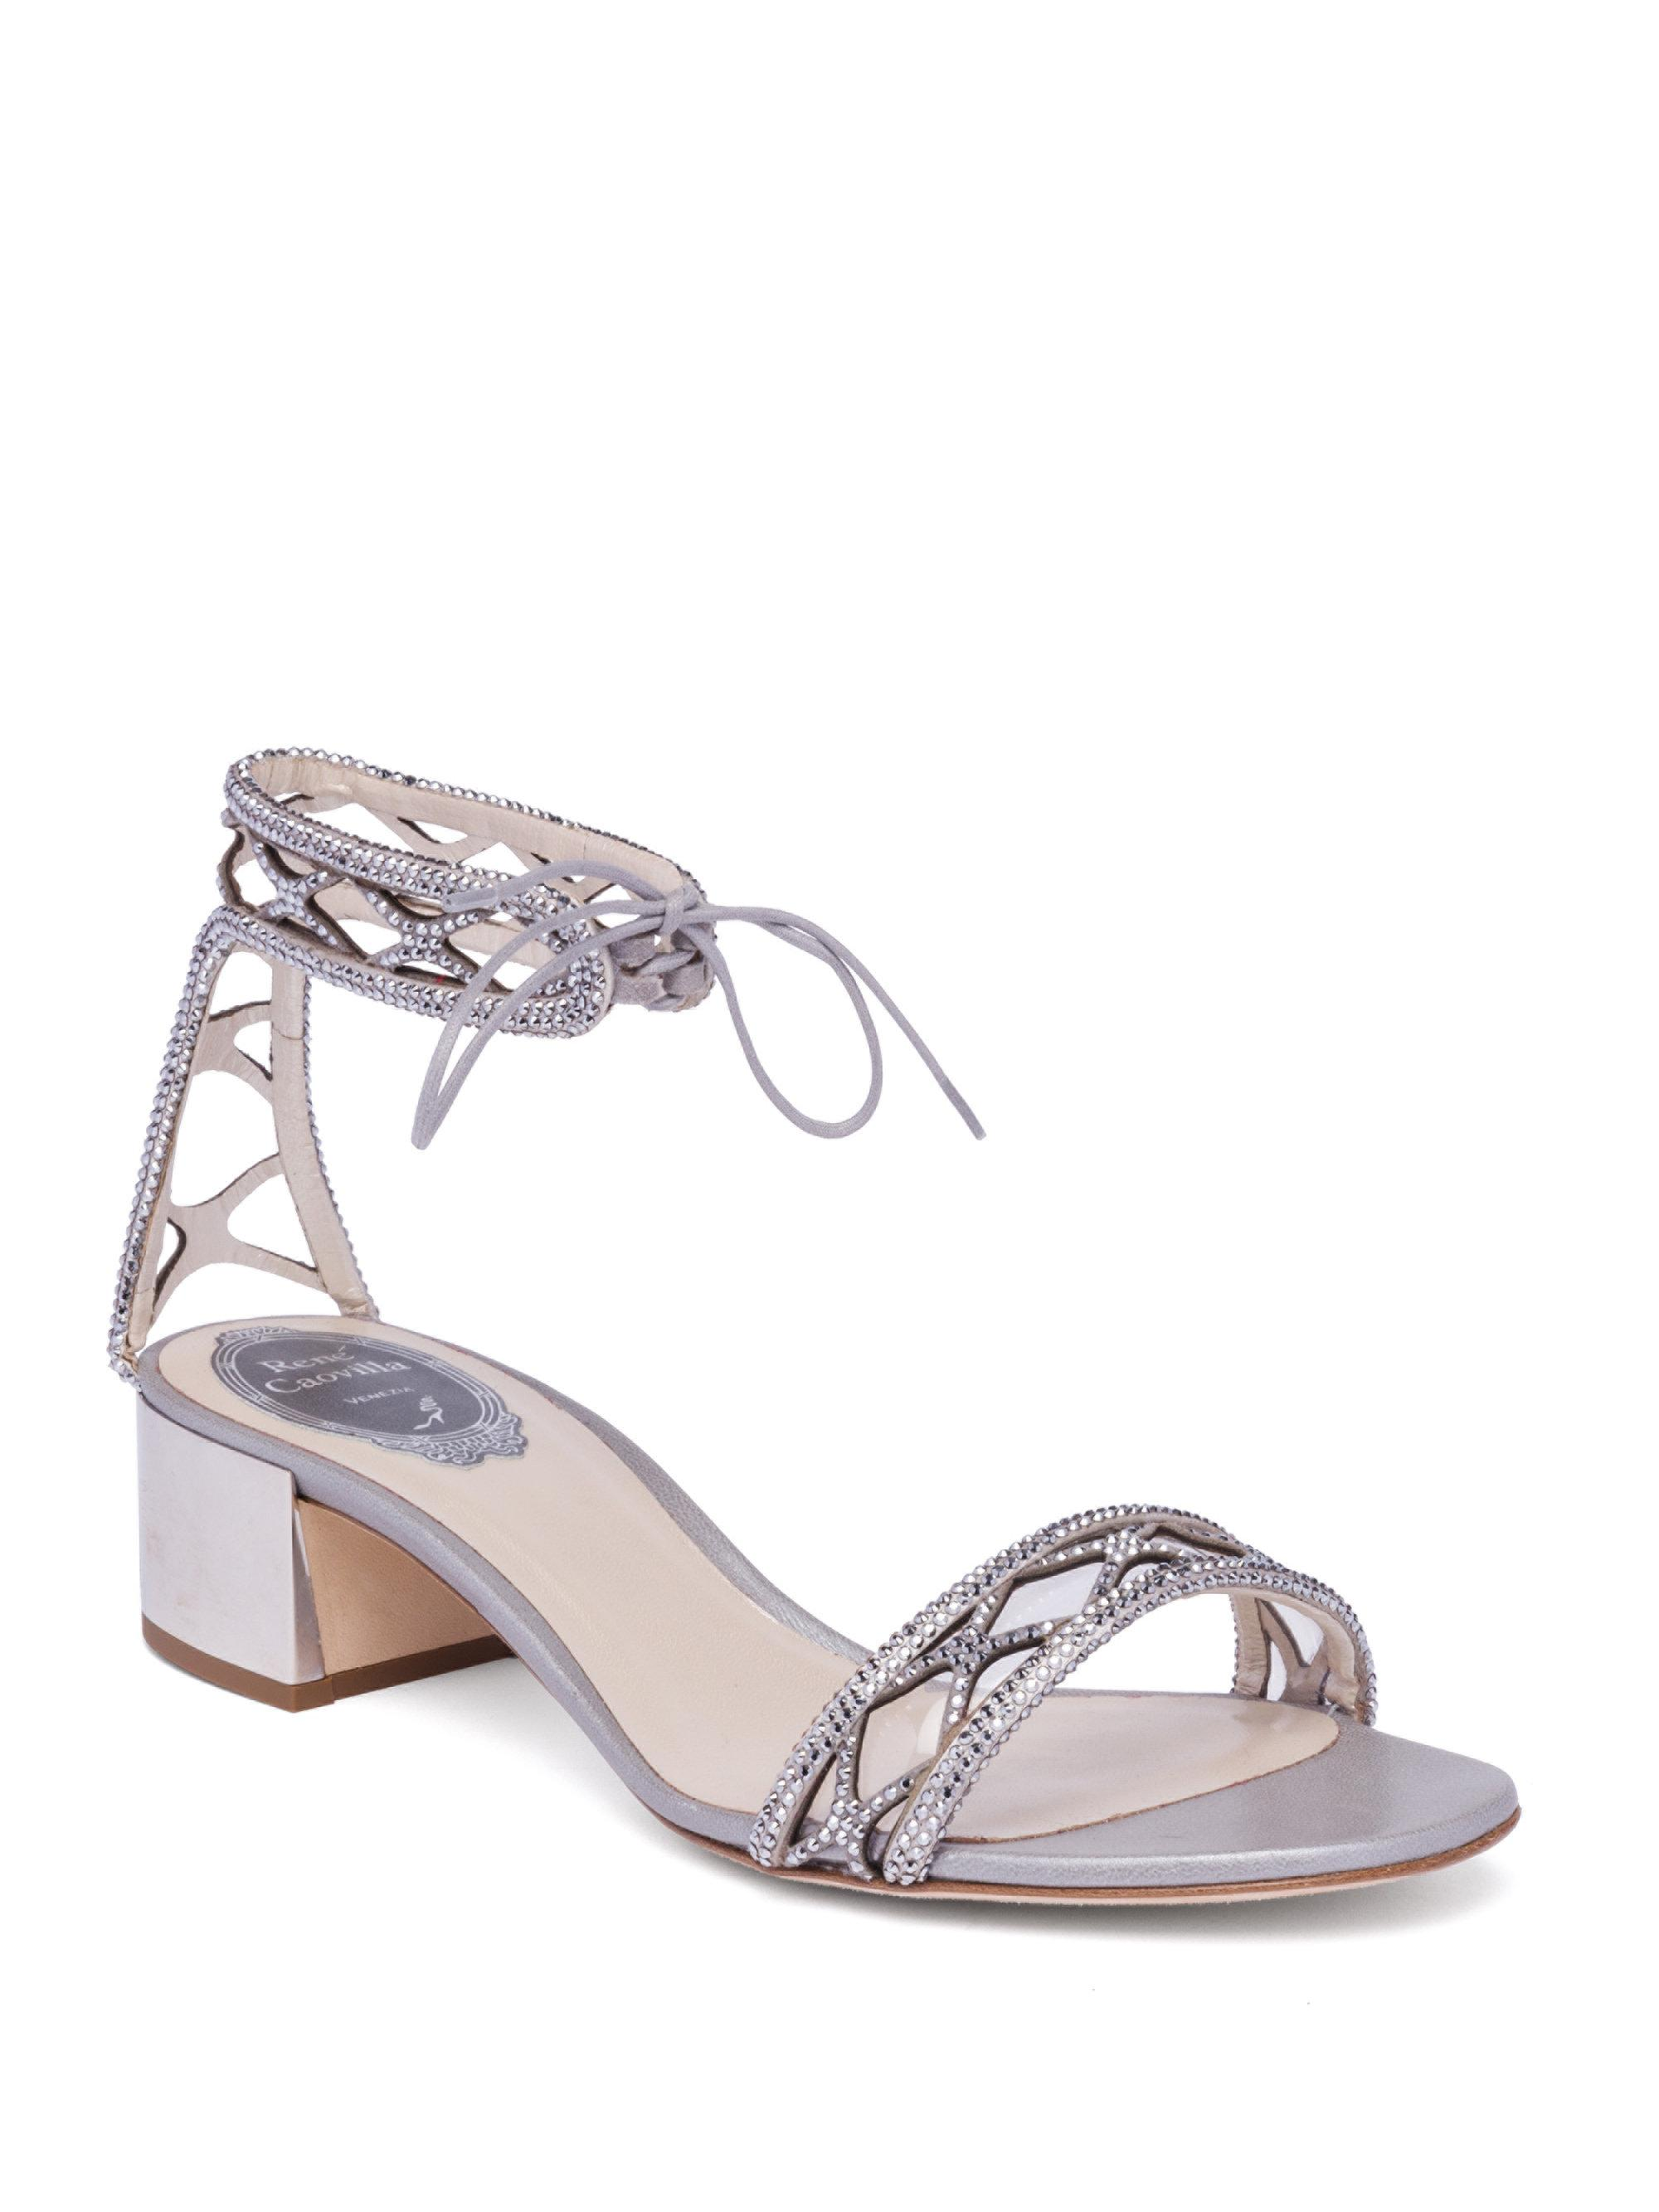 ankle strap sandals - Grey Rene Caovilla WHSRy2R